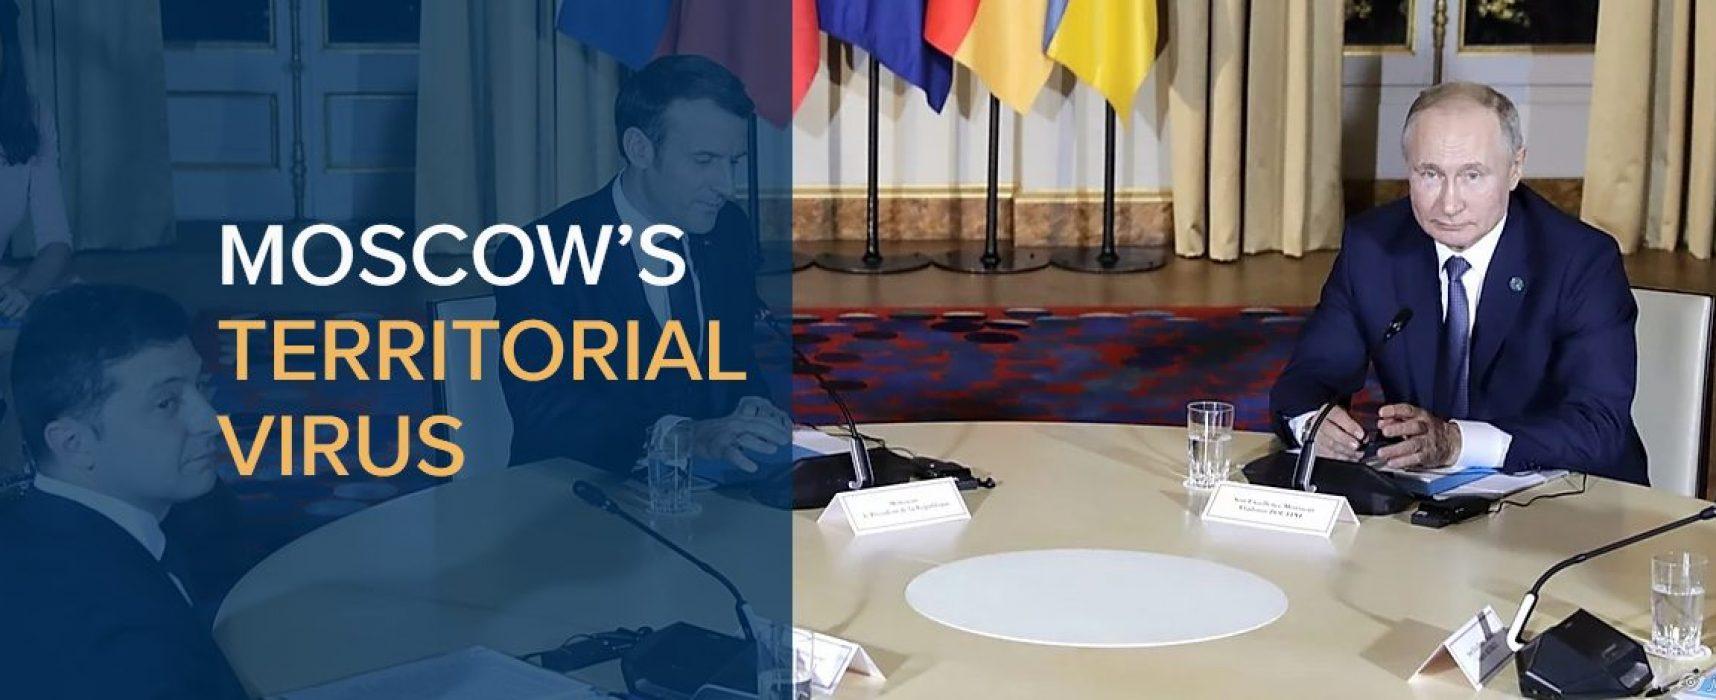 Moscow's territorial virus: Countering the Kremlin's incapacitation of Ukraine